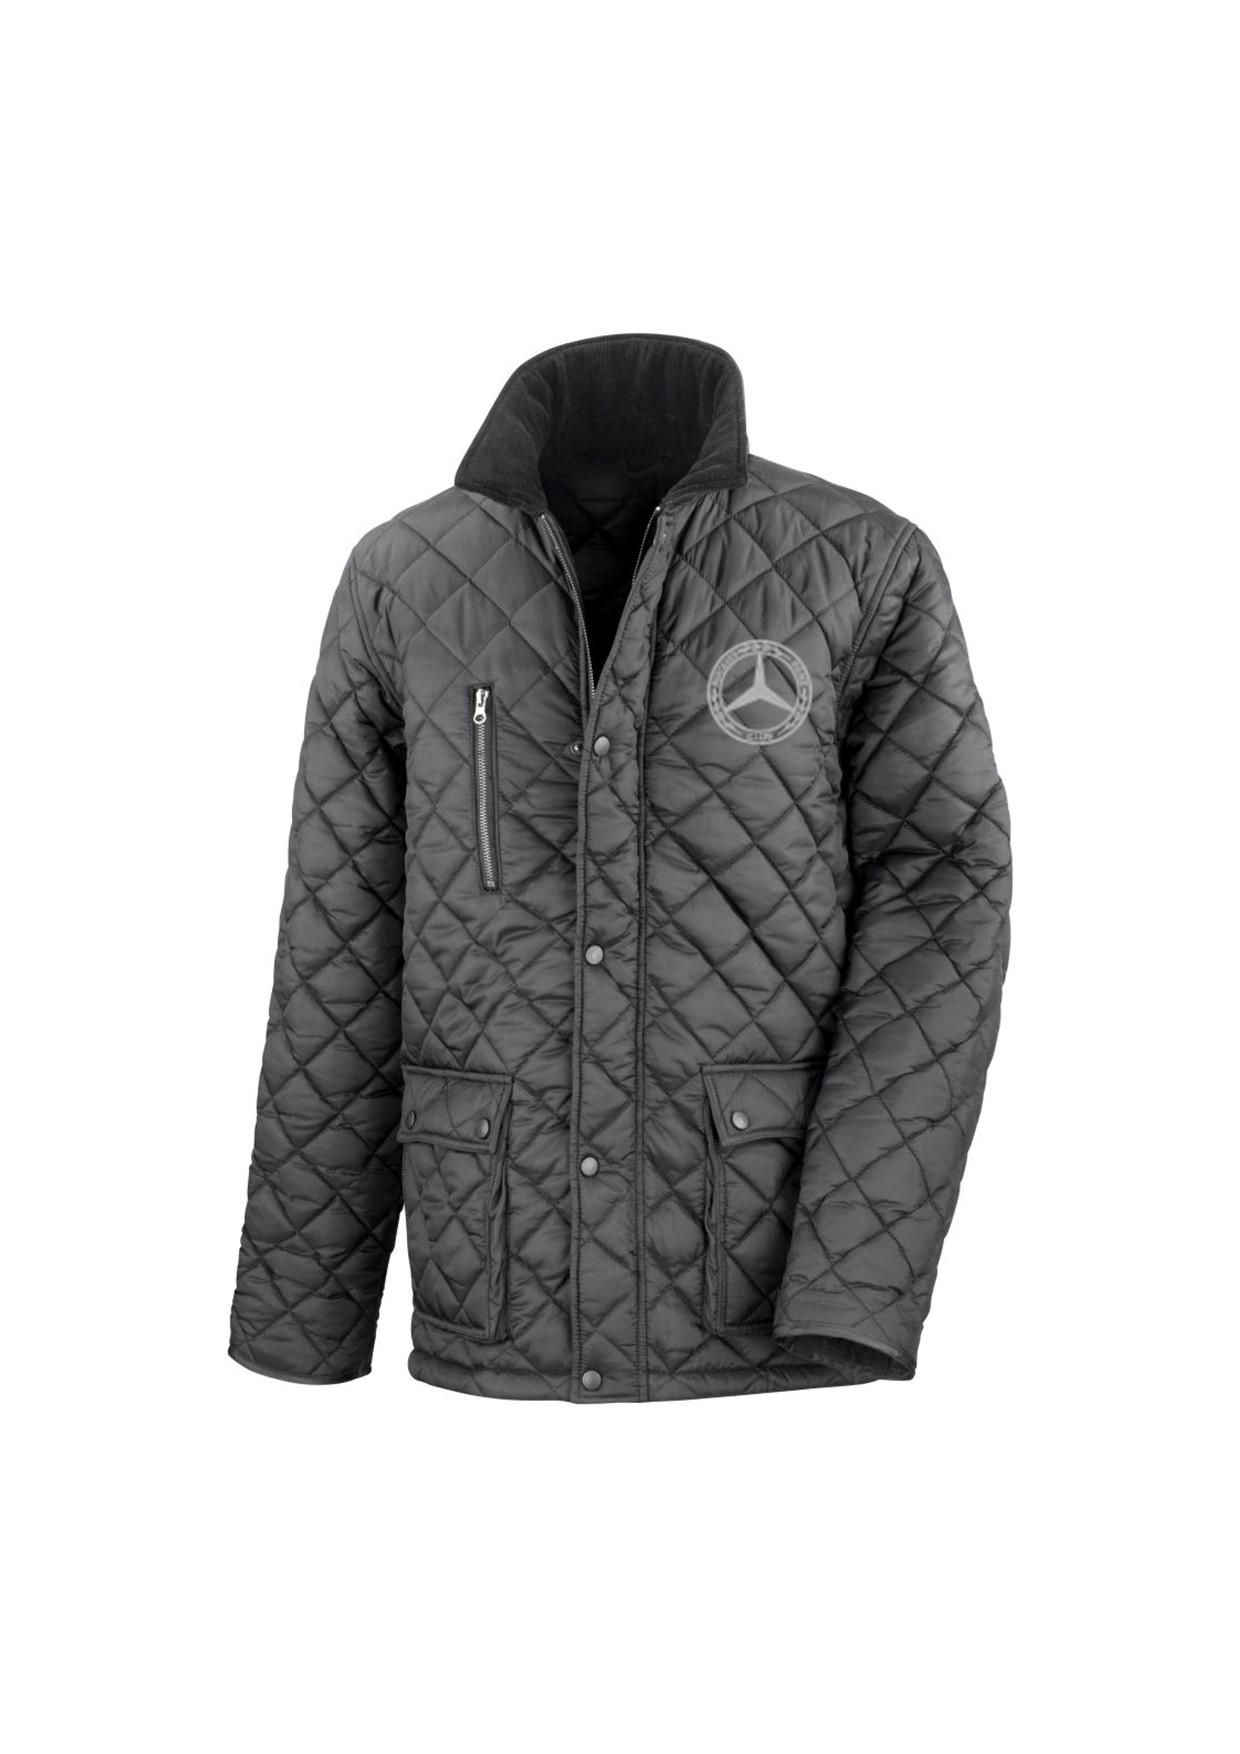 Mercedes-Benz Club Urban Quilted Jacket Black